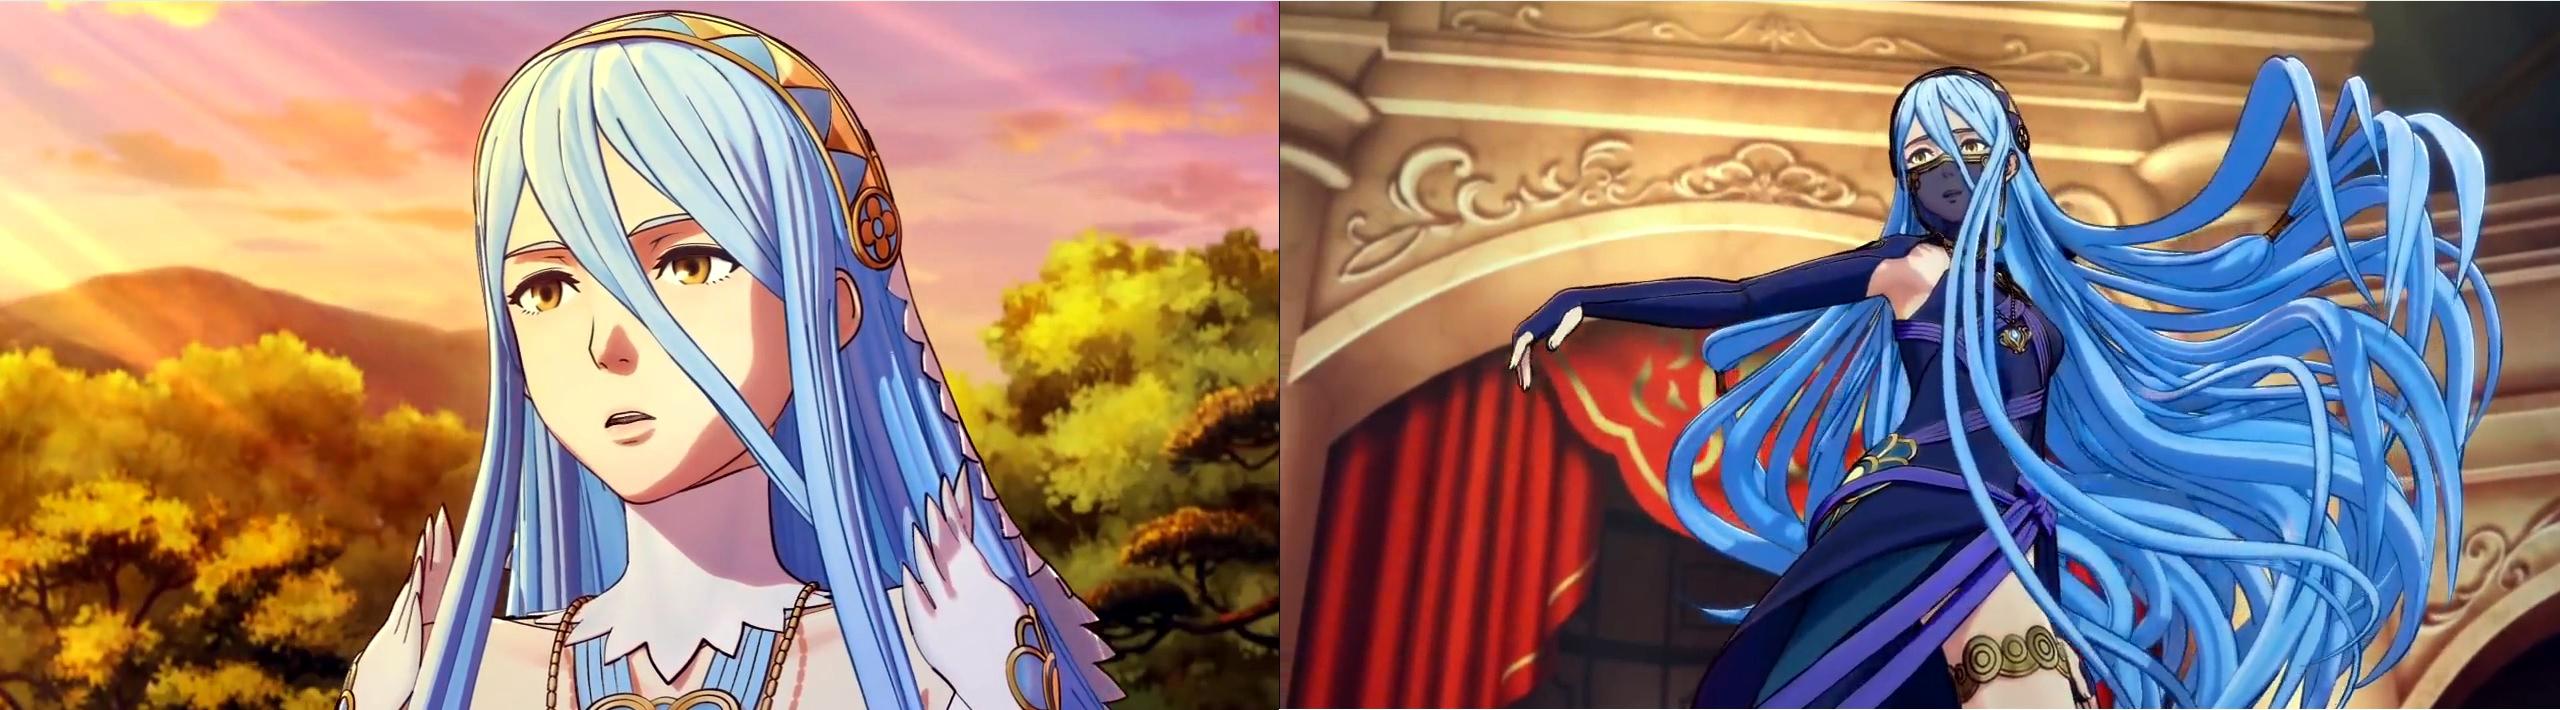 Aqua, the mysterious main heroine.